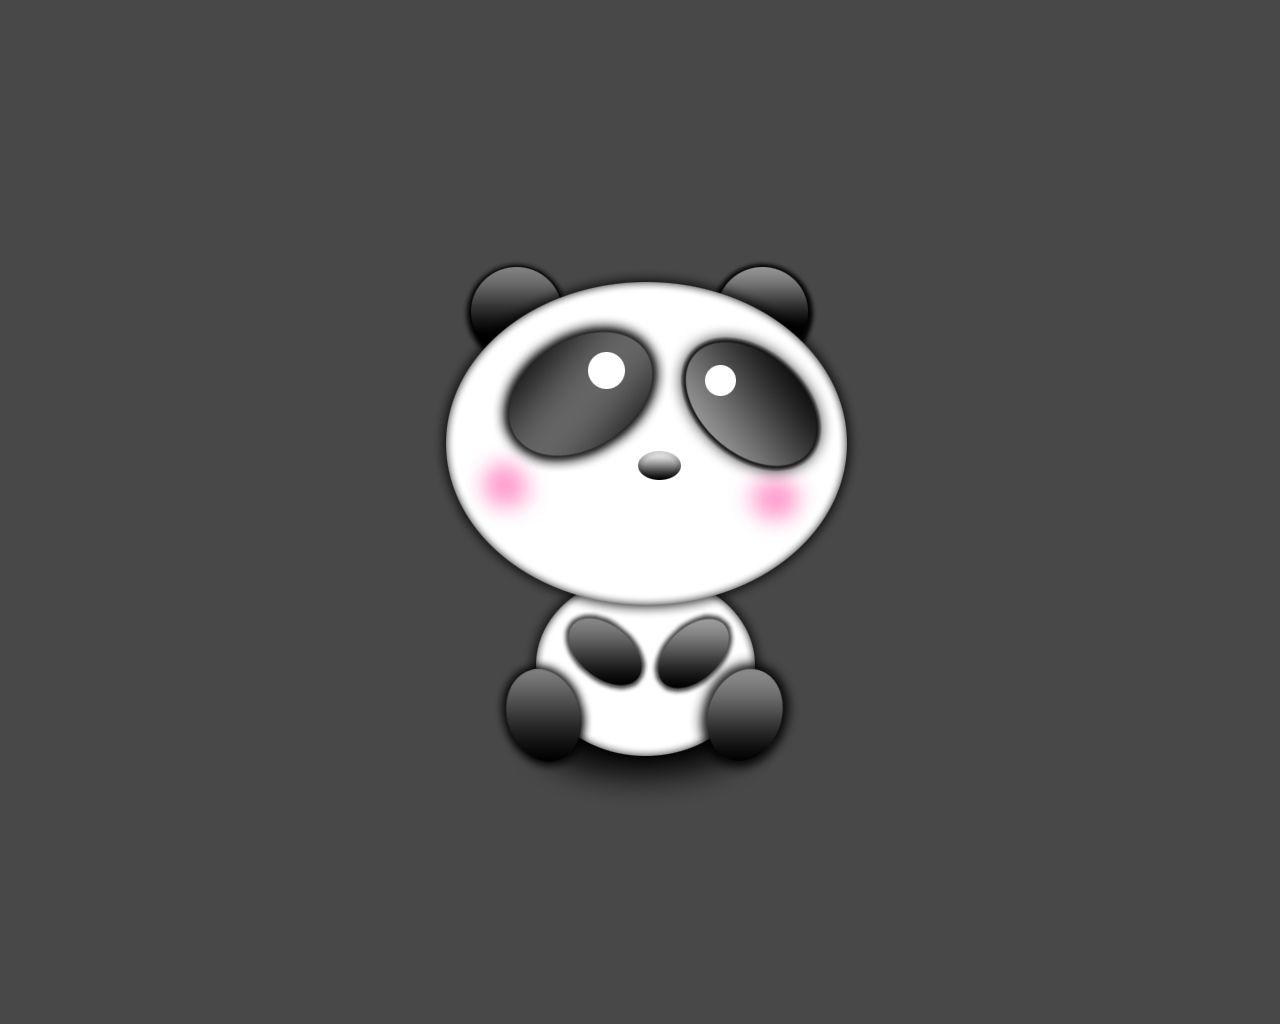 Cute Panda Wallpaper Background Hd Desktop Wallpaper Instagram Photo Background Image Panda Wallpapers Cute Panda Wallpaper Cute Panda